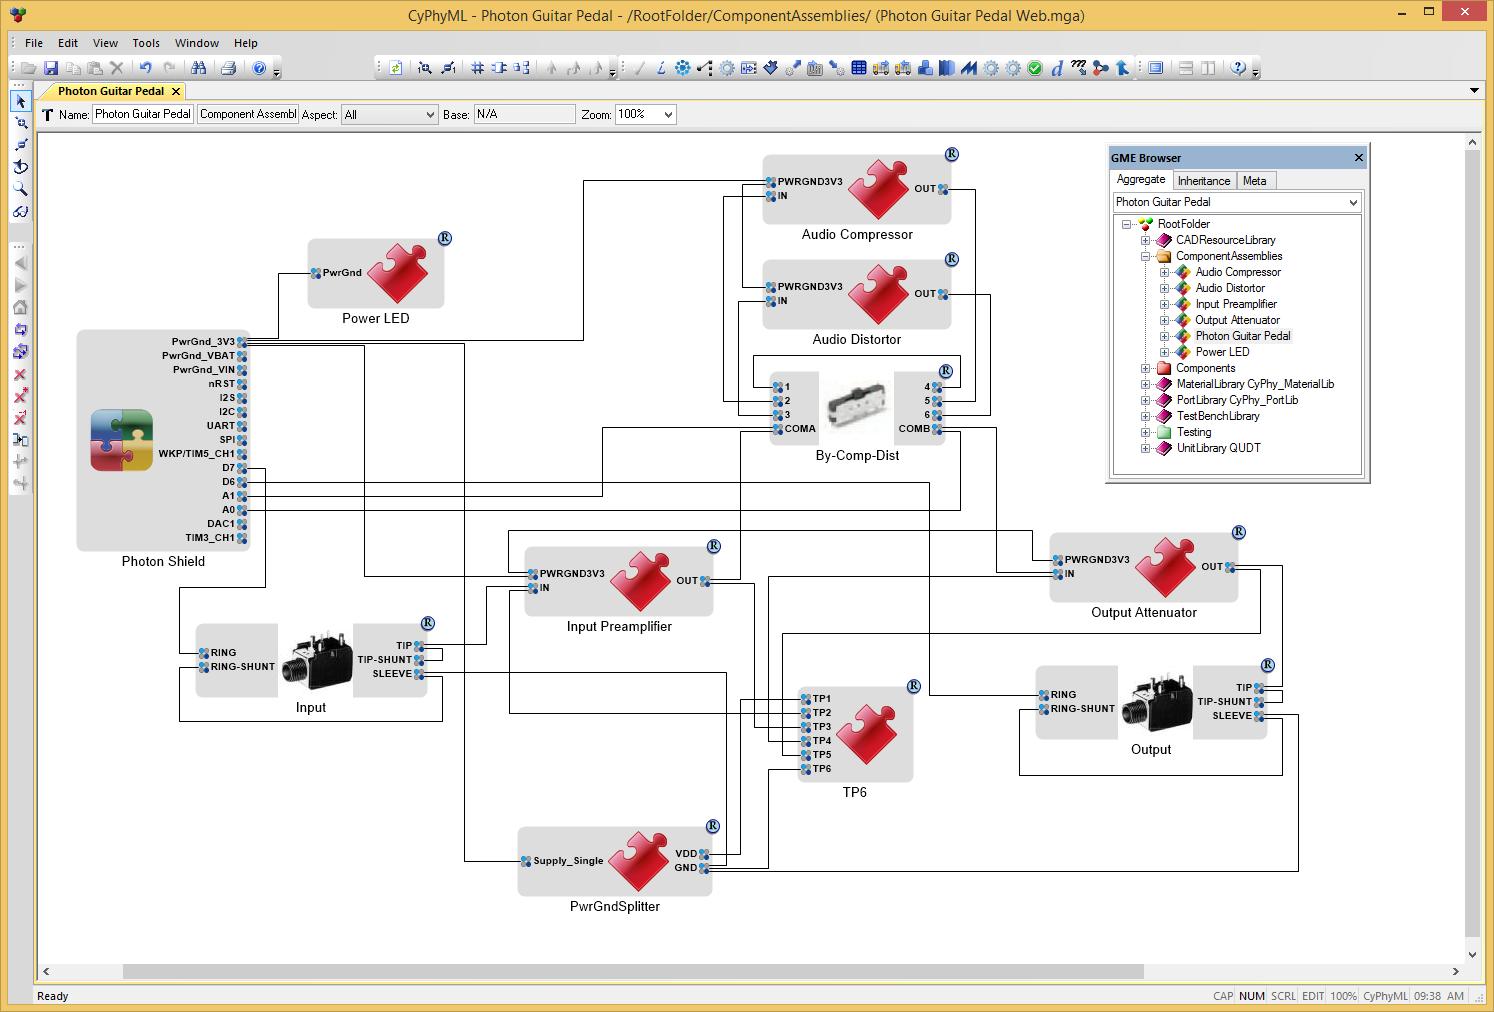 Fig. 7:The final Photon Guitar Pedal design in the MetaMorph Desktop Tools.